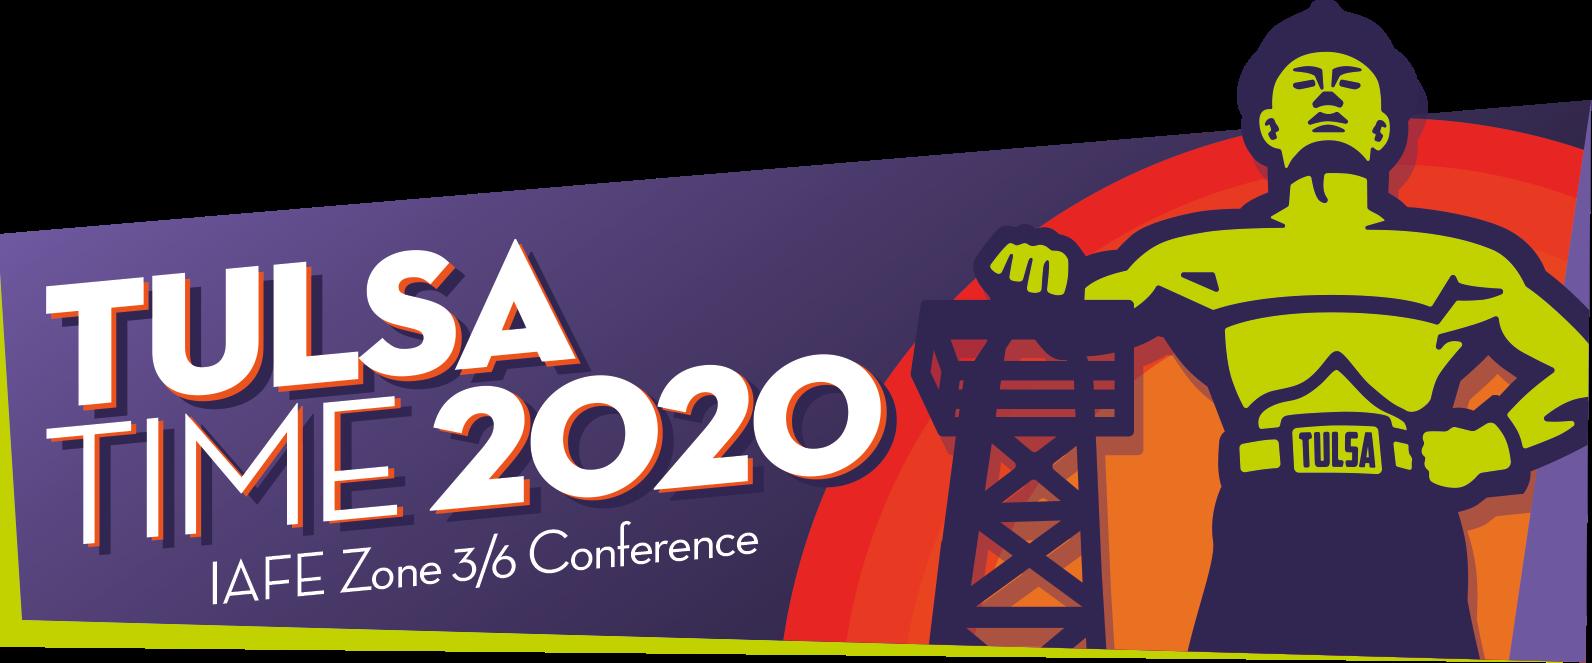 Tulsa Time 2020 - IAFE 2020 Zone 3/6 Meeting